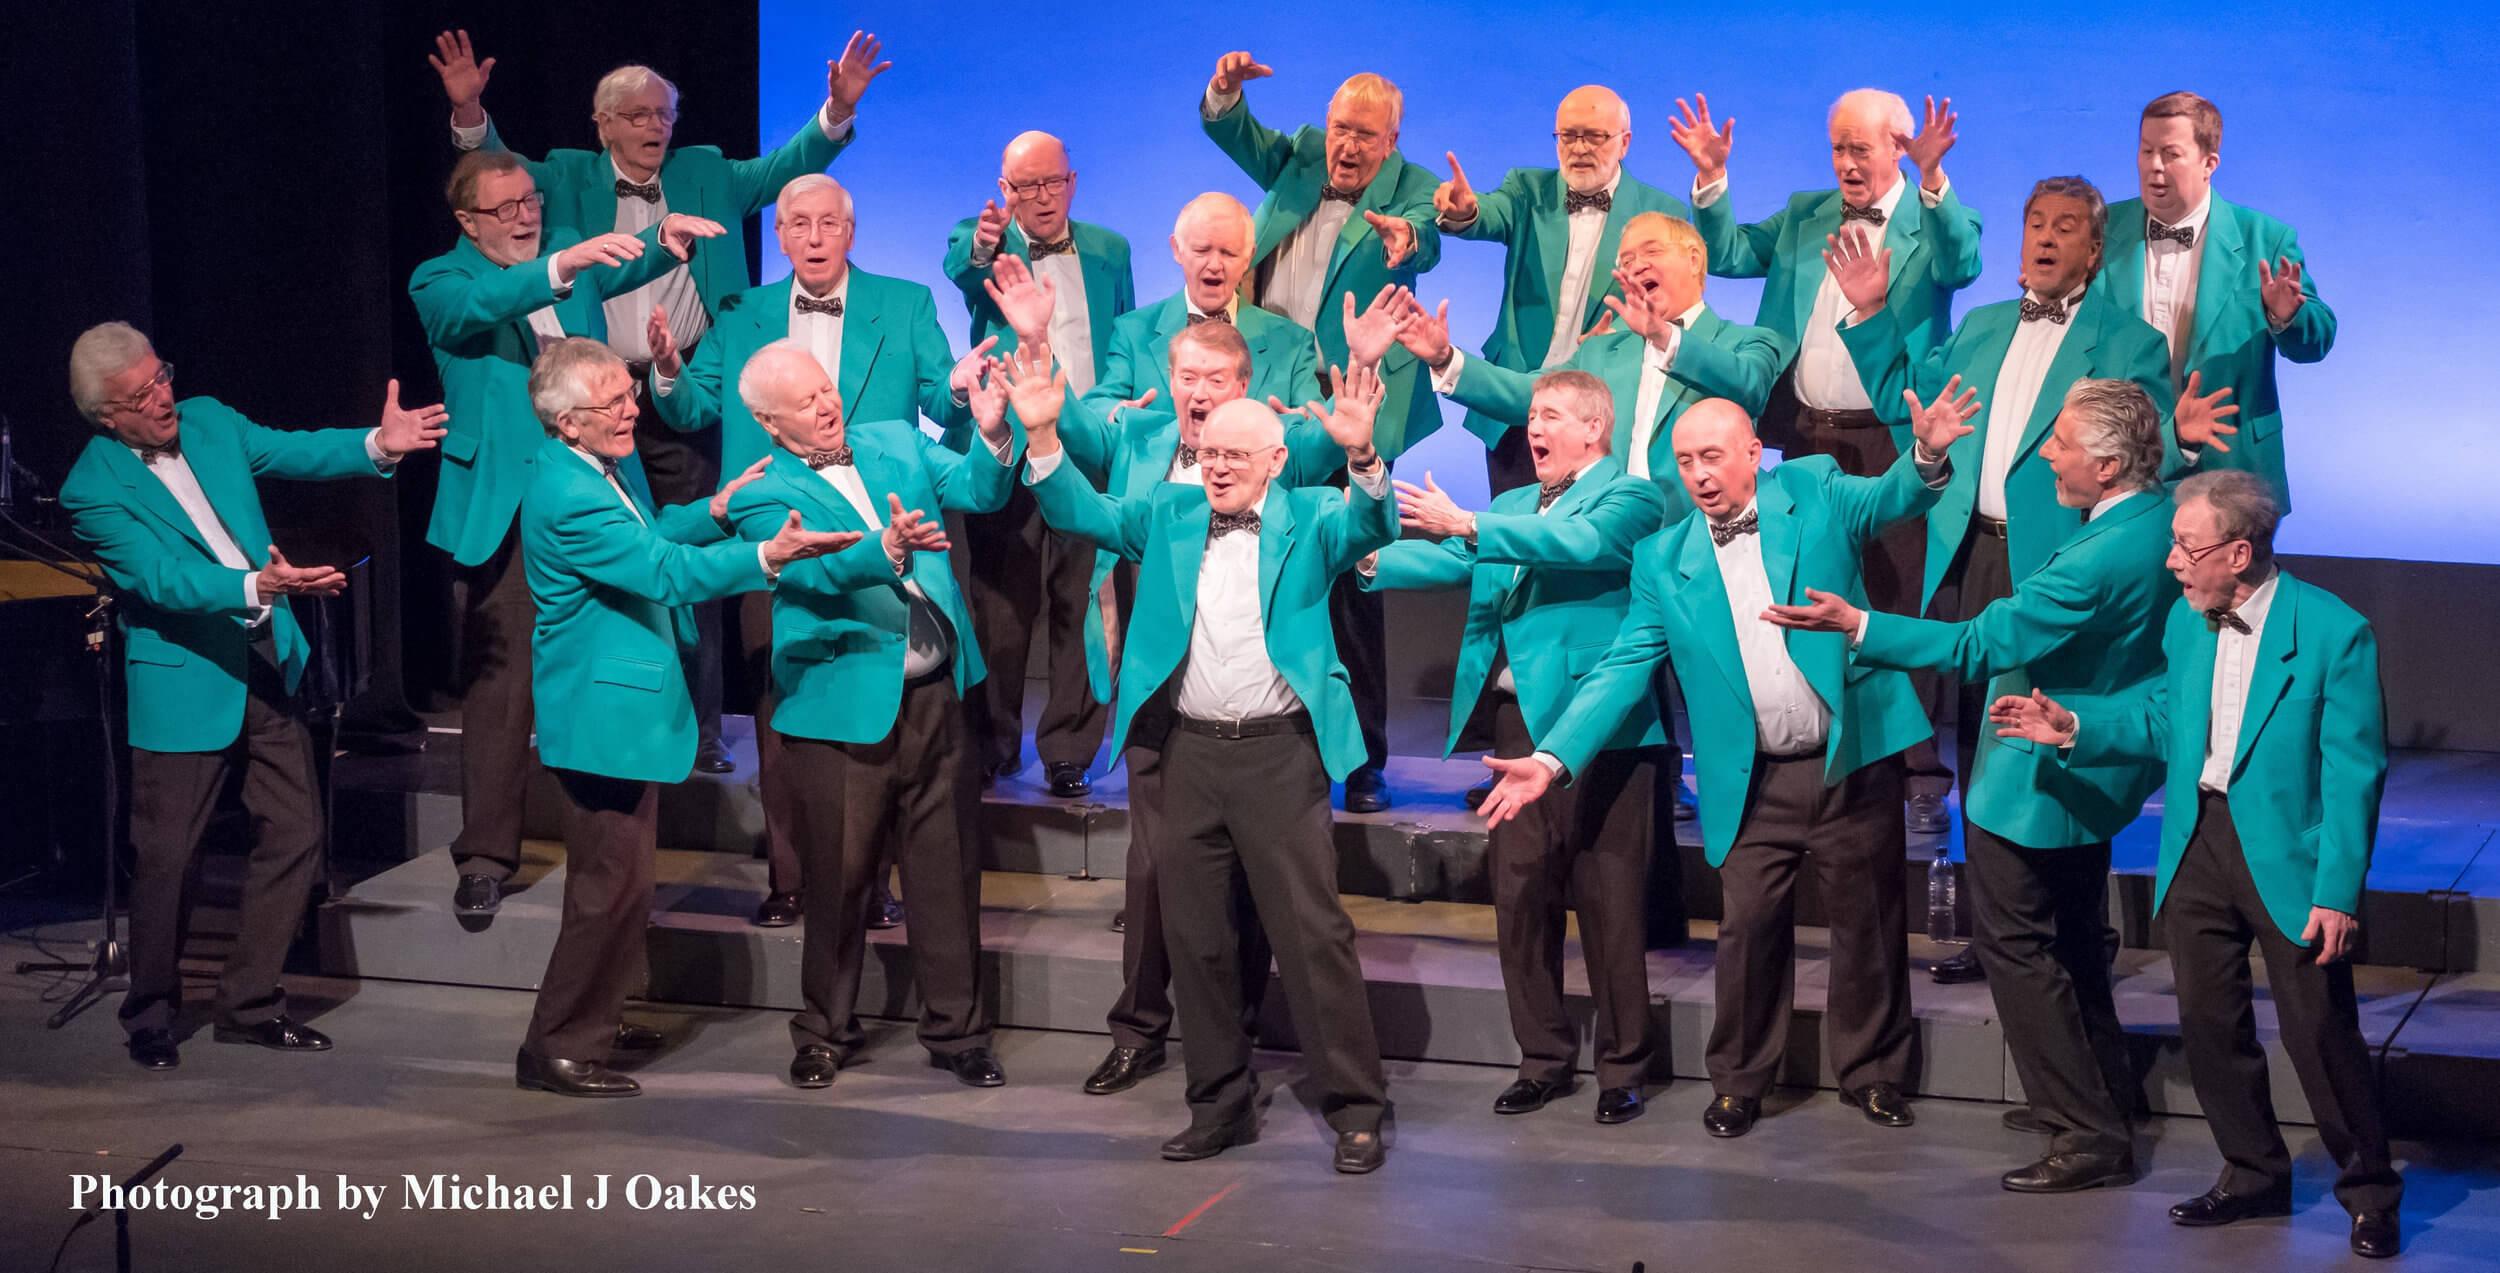 Daytones Harmony Barbershop Chorus